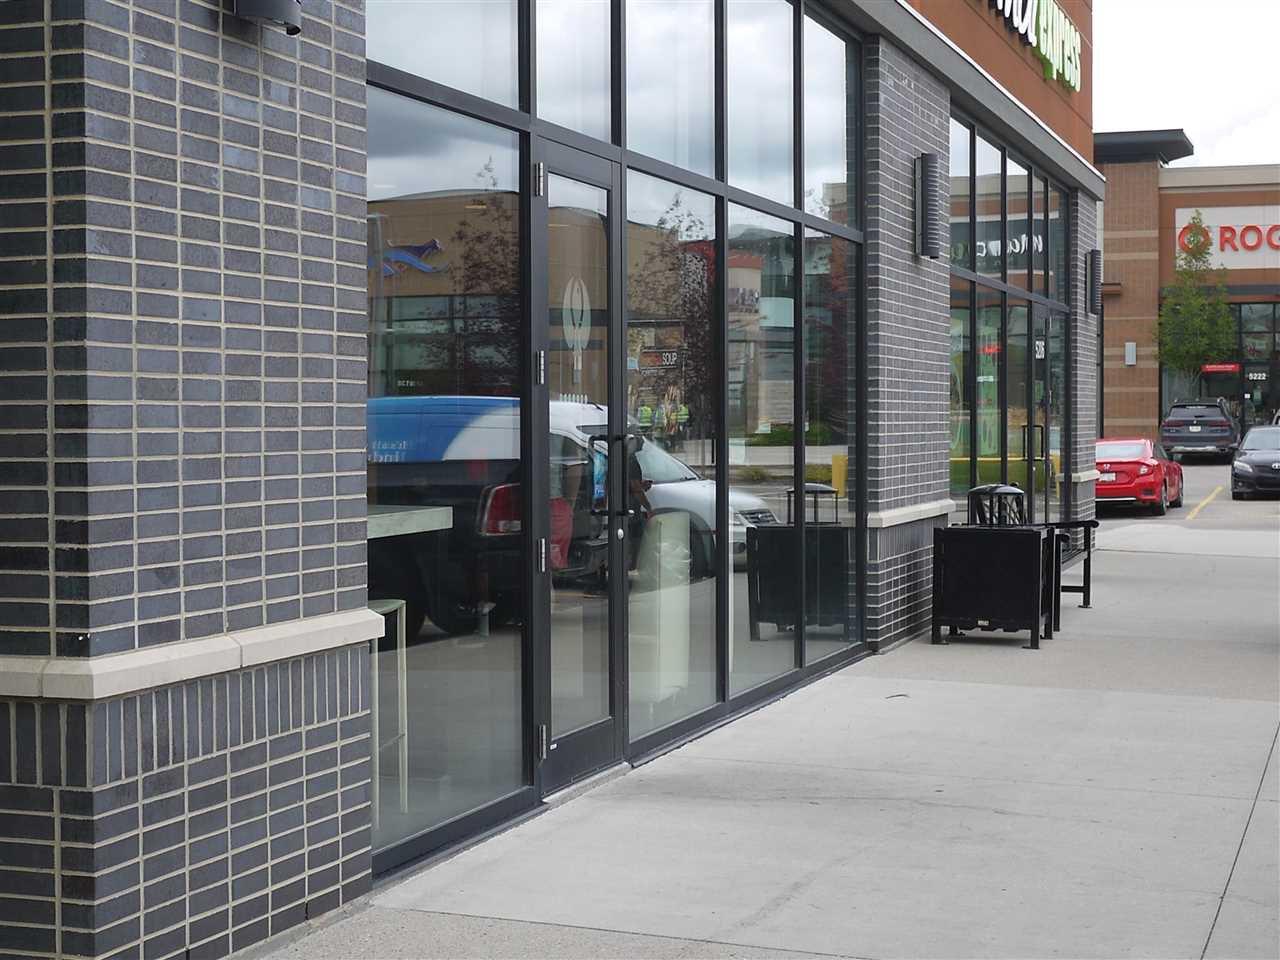 Main Photo: 0 0 in Edmonton: Zone 56 Business for sale : MLS®# E4169290